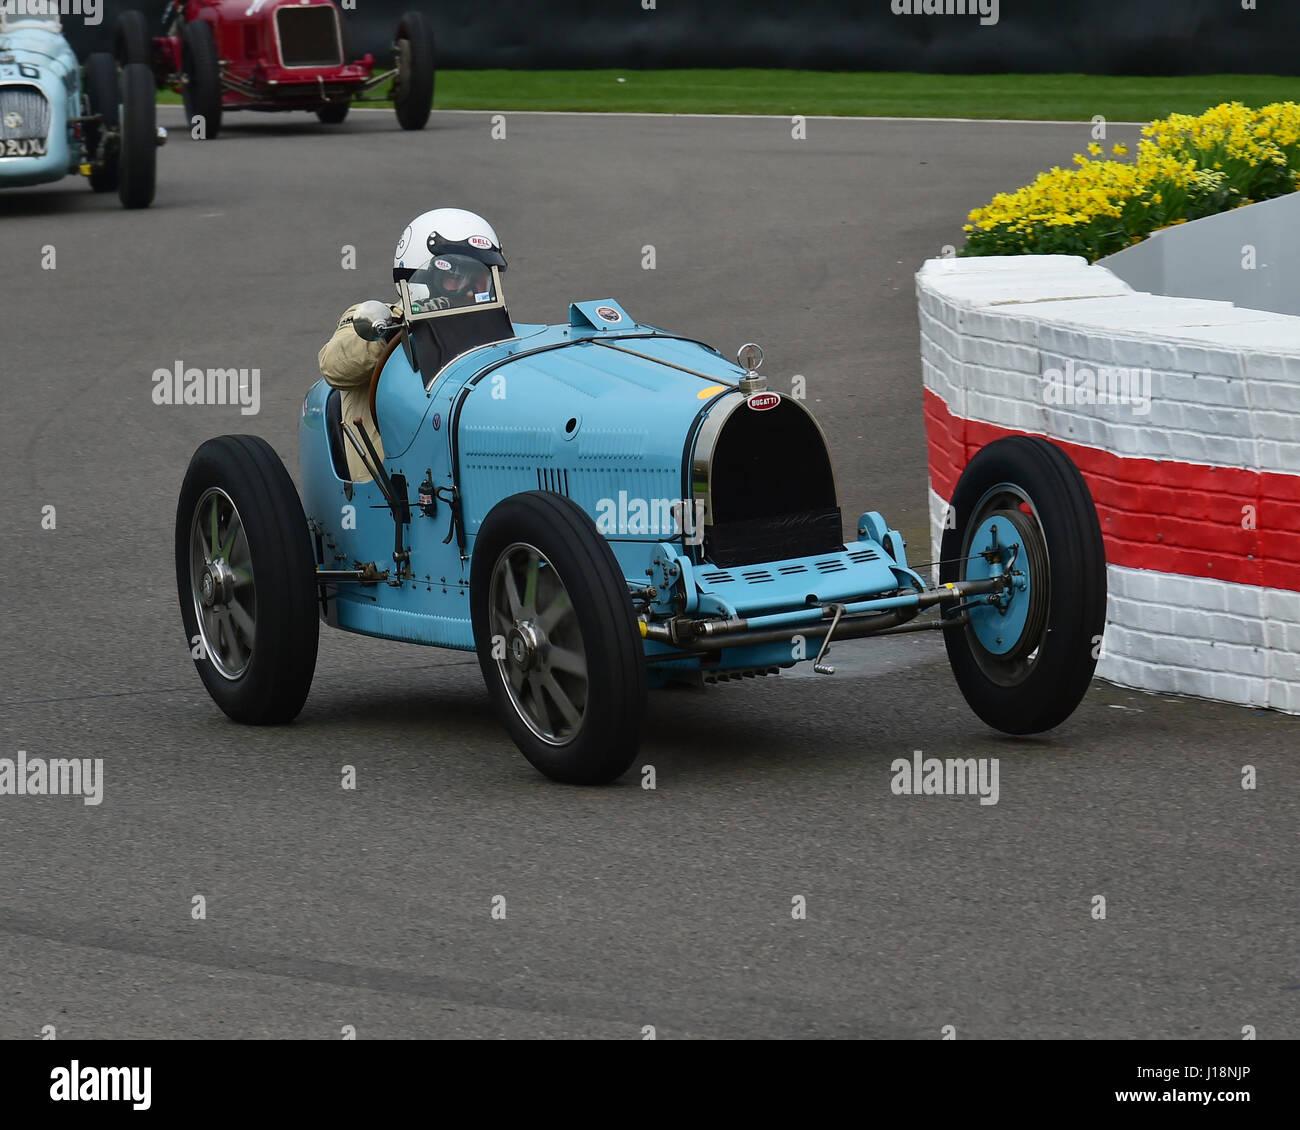 bo williams, bugatti type 35b, varzi trophy, for french & italian